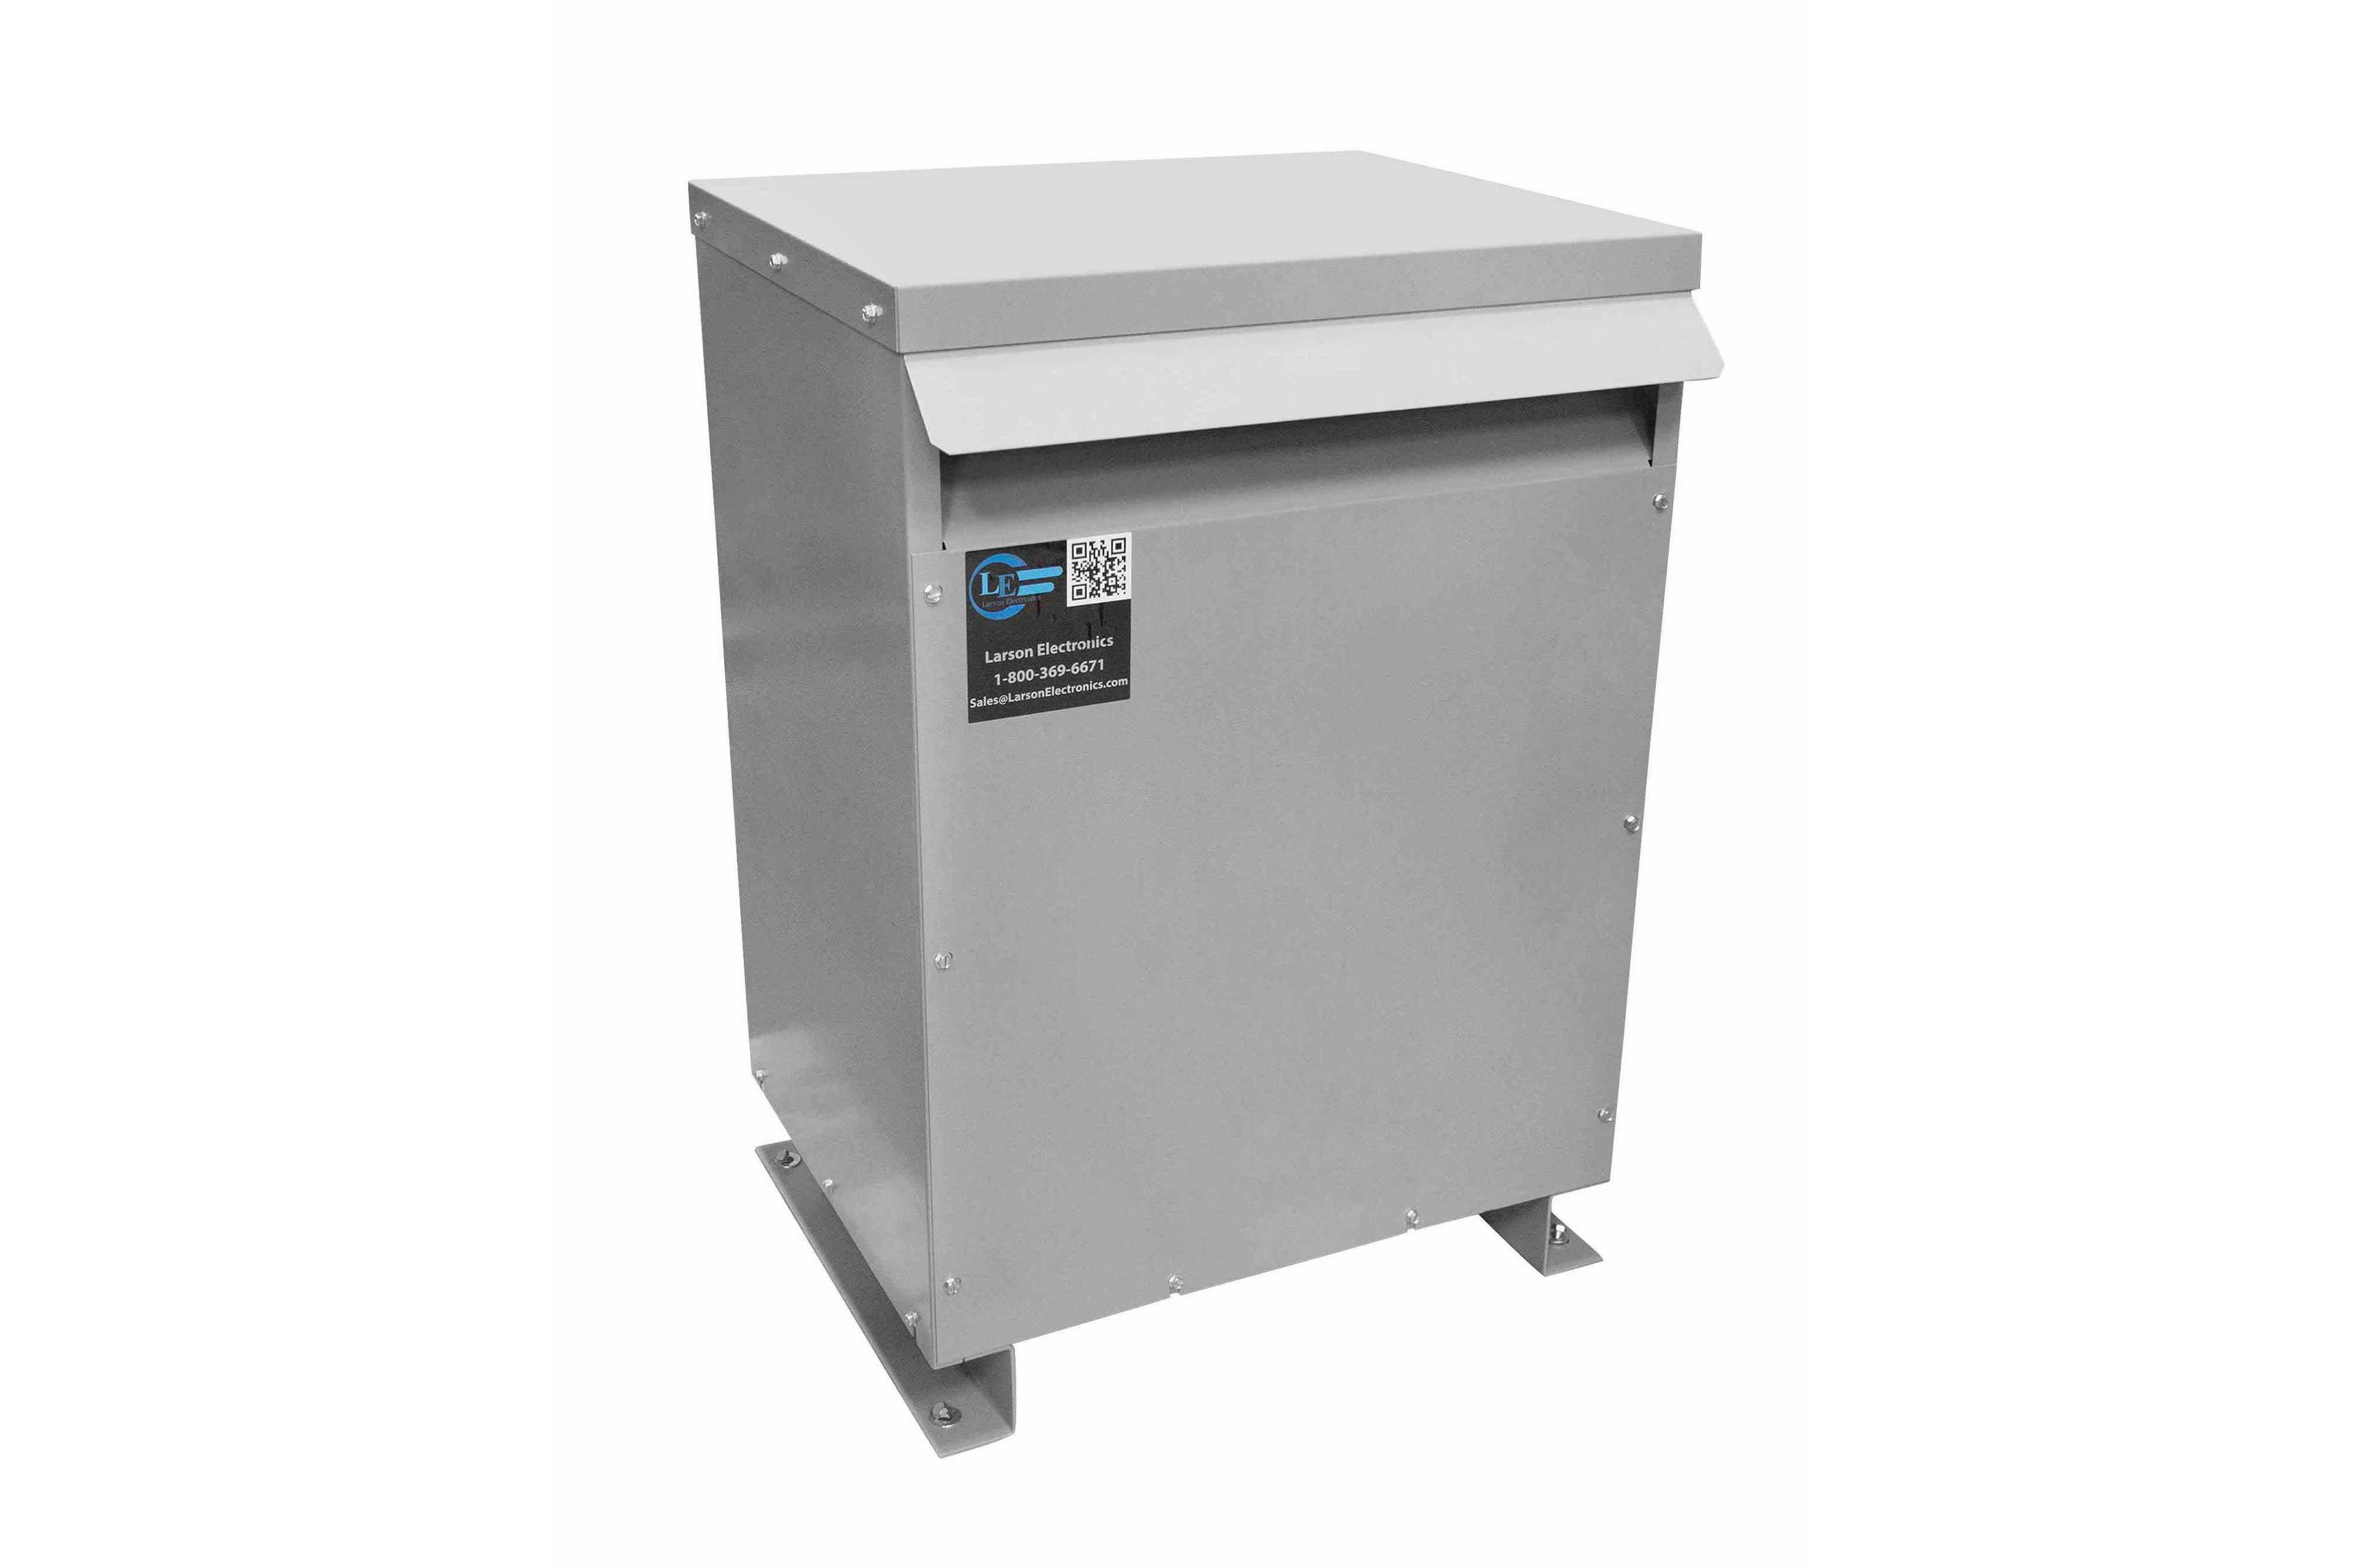 45 kVA 3PH Isolation Transformer, 460V Wye Primary, 600Y/347 Wye-N Secondary, N3R, Ventilated, 60 Hz